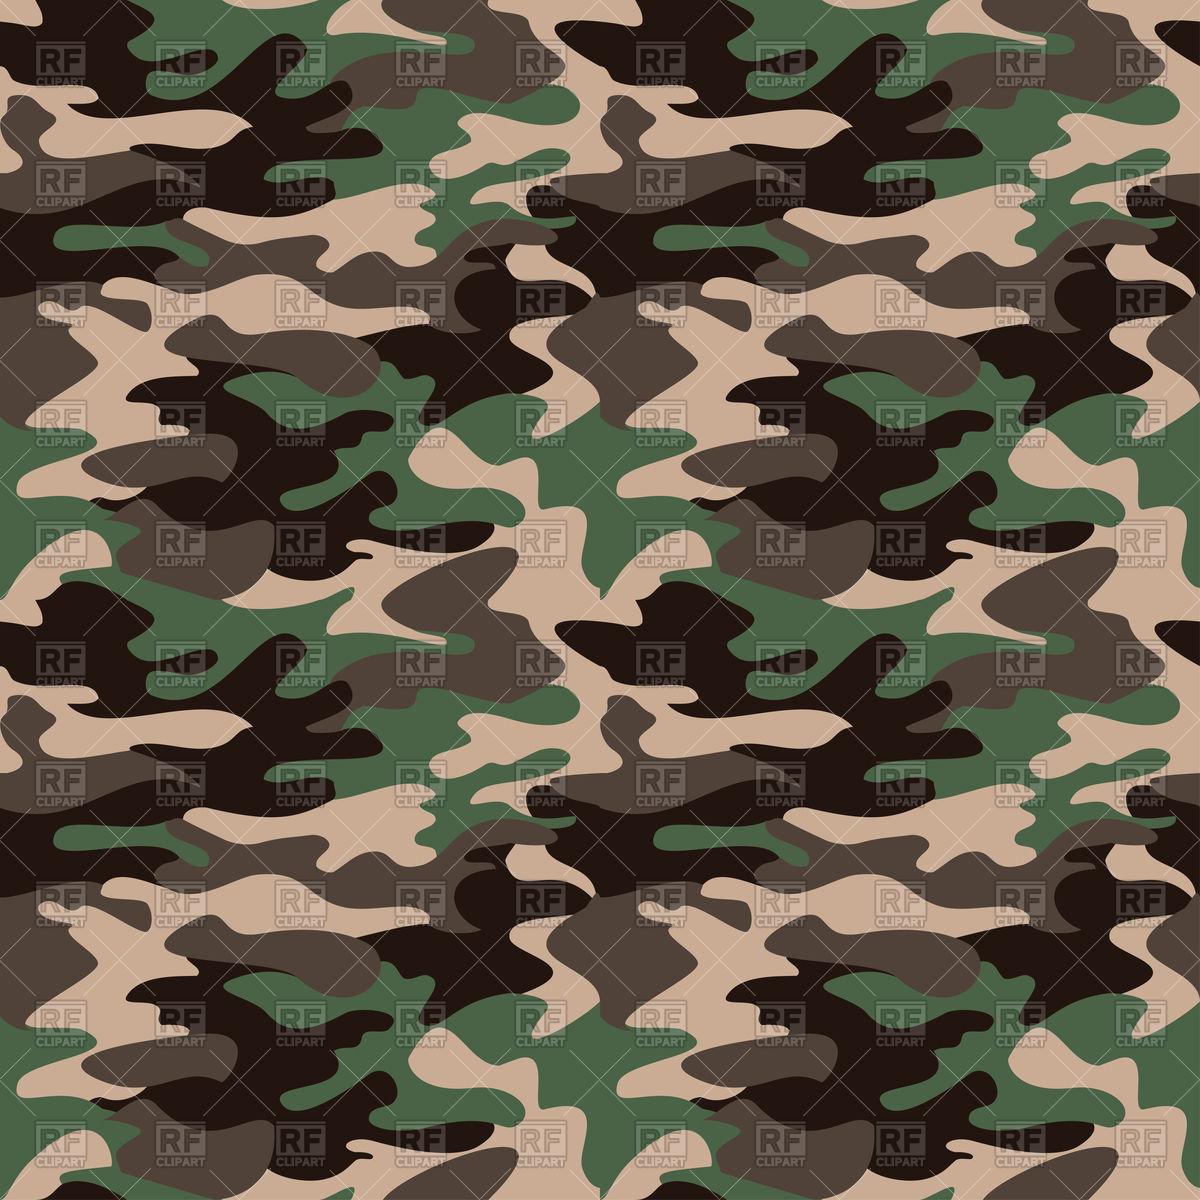 Camouflage pattern background.